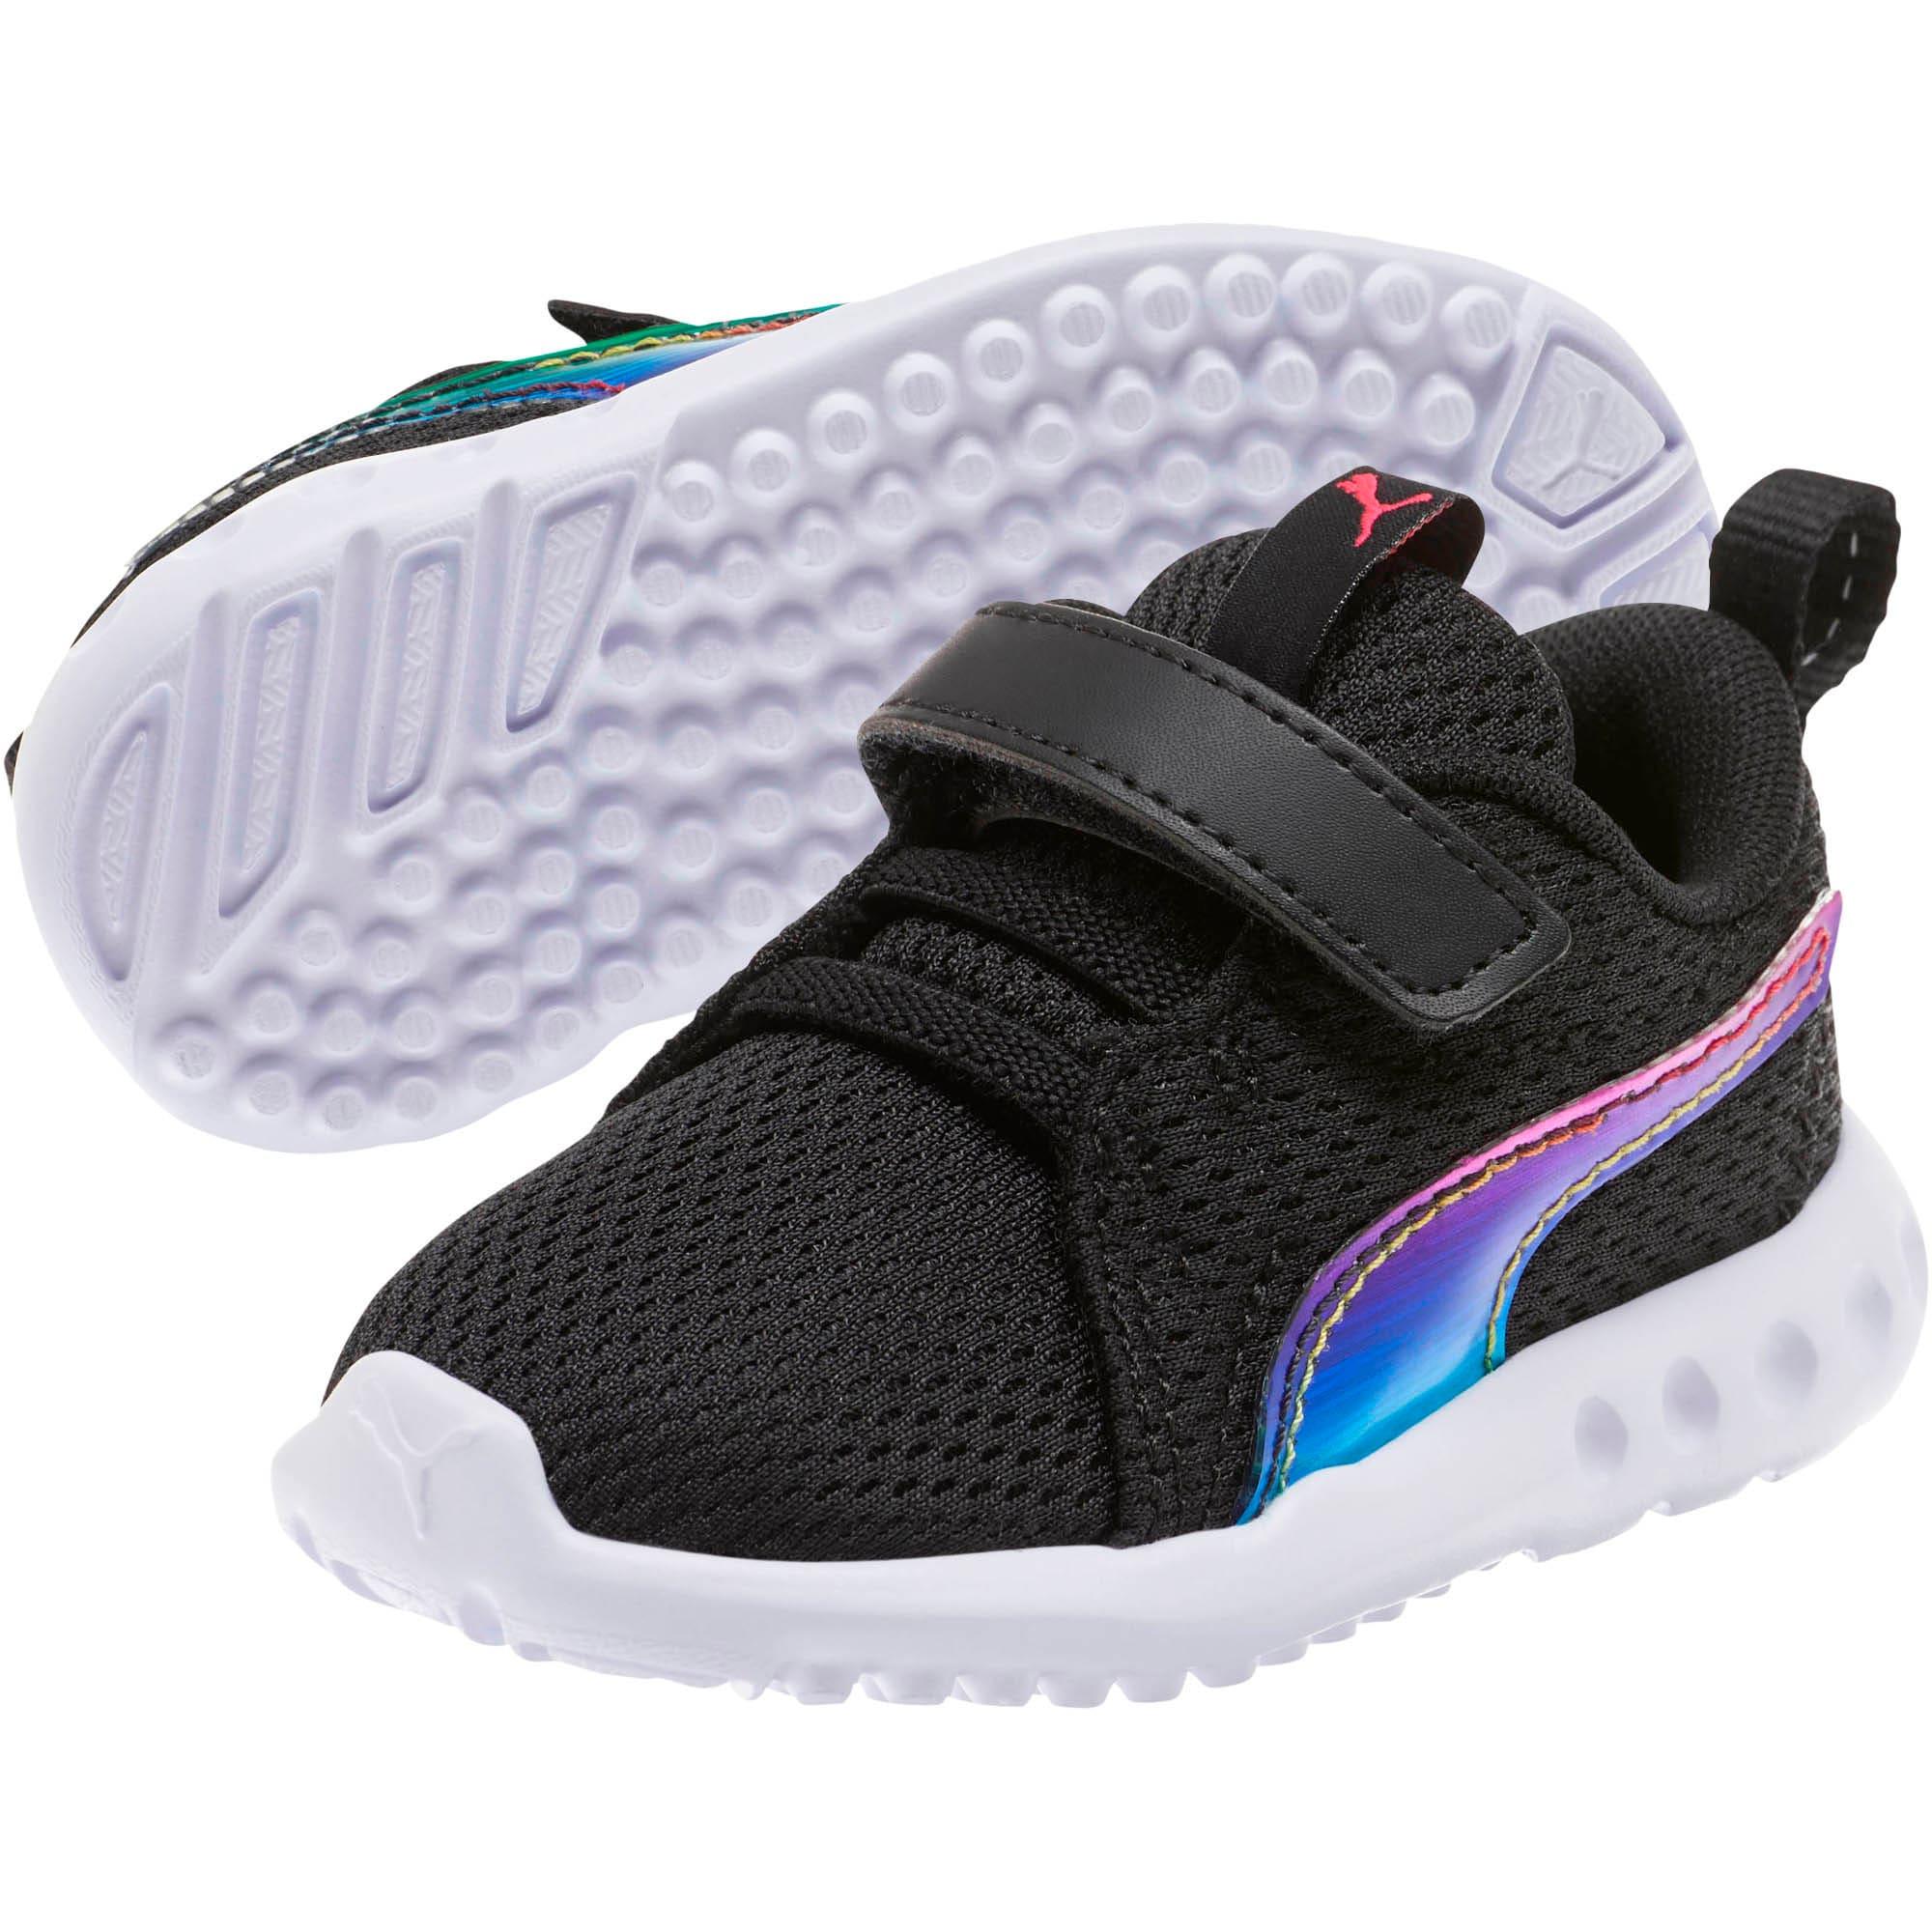 Thumbnail 2 of Carson 2 Iridescent Toddler Shoes, Puma Black-Puma White, medium